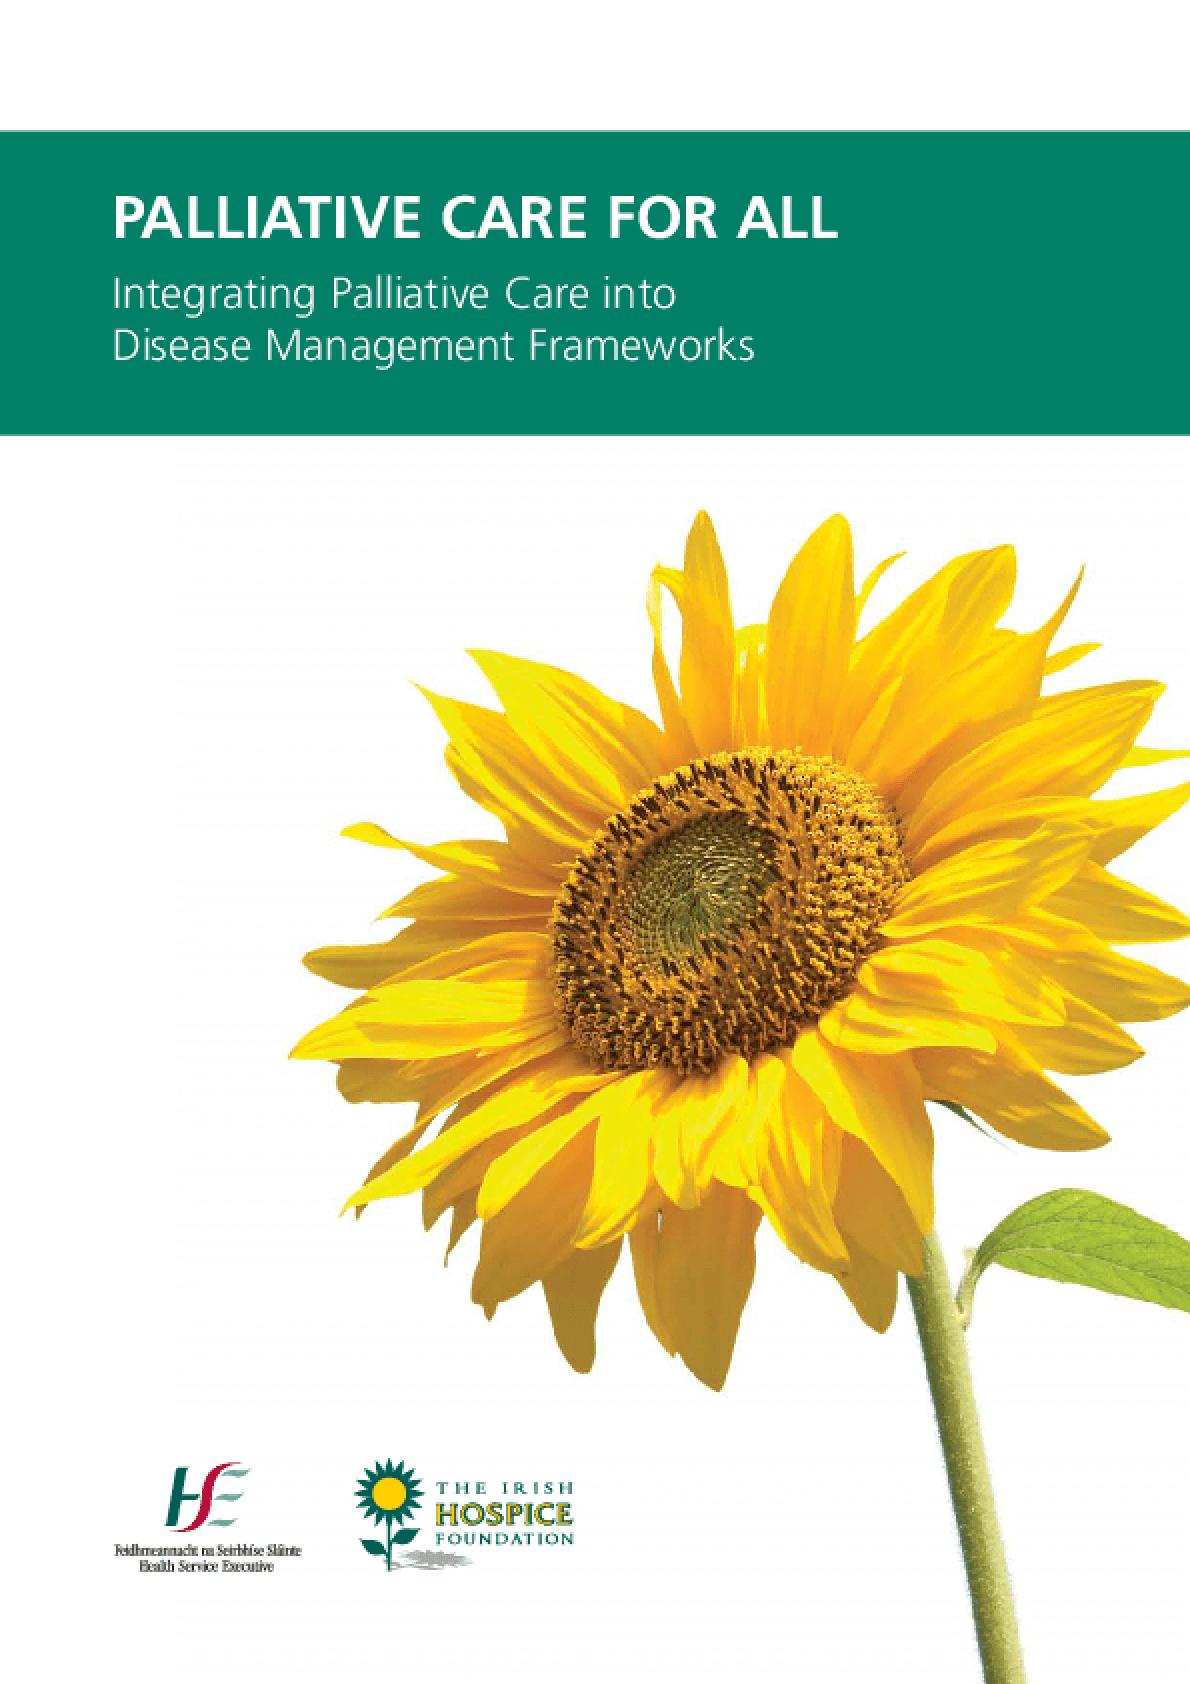 Palliative Care for All: Integrating Palliative Care into Disease Management Frameworks